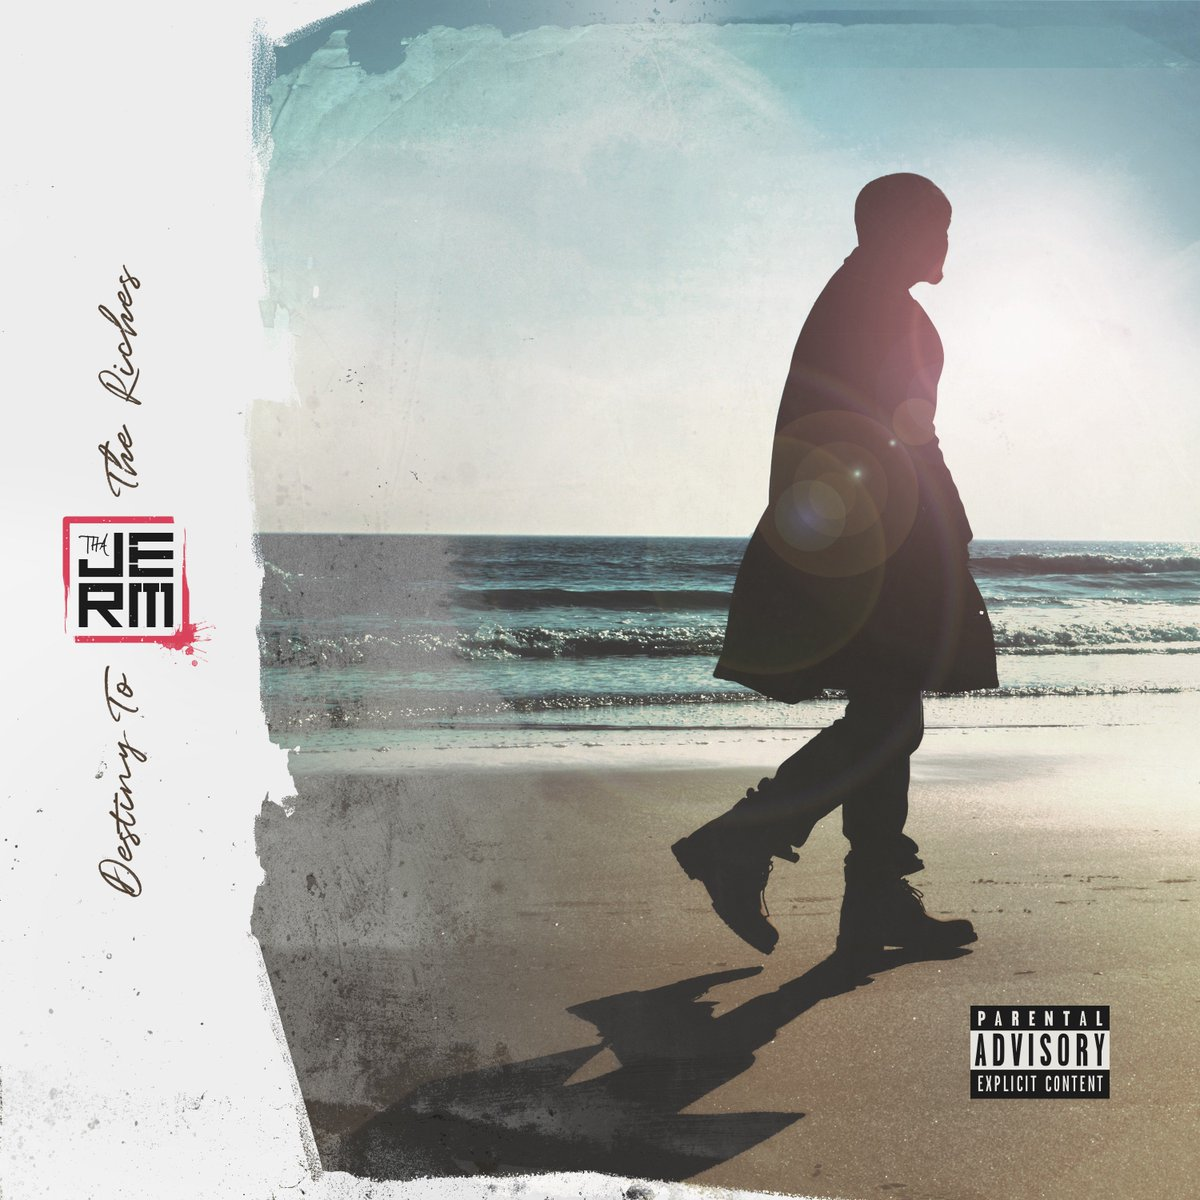 . @ThaJerm_SOI Releases His Latest Effort 'Destiny To The Riches' (Audio Stream) -- goo.gl/6Lq1er